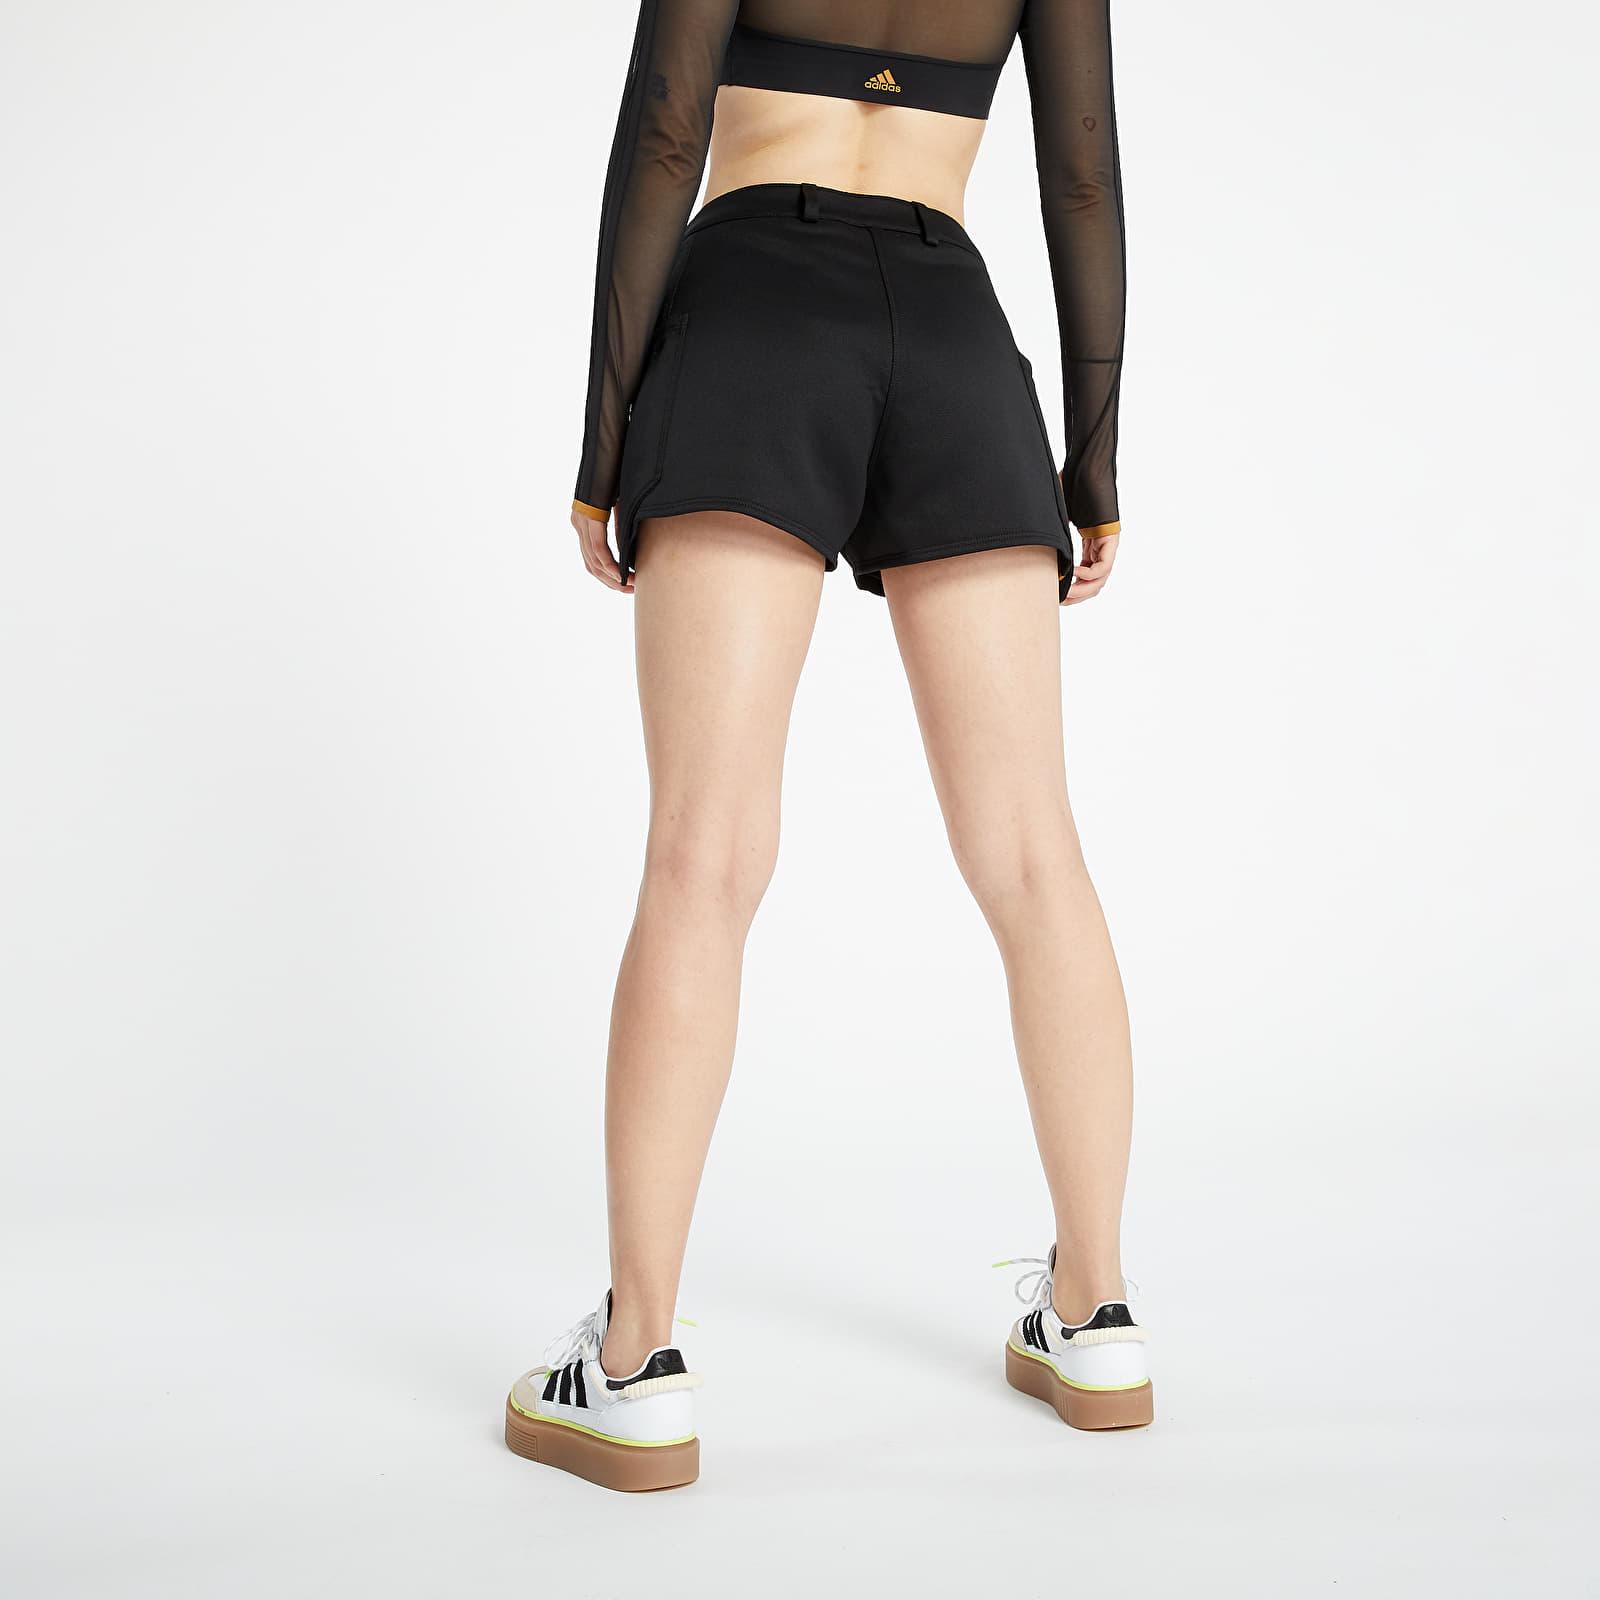 Shorts adidas x Ivy Park Shorts Black